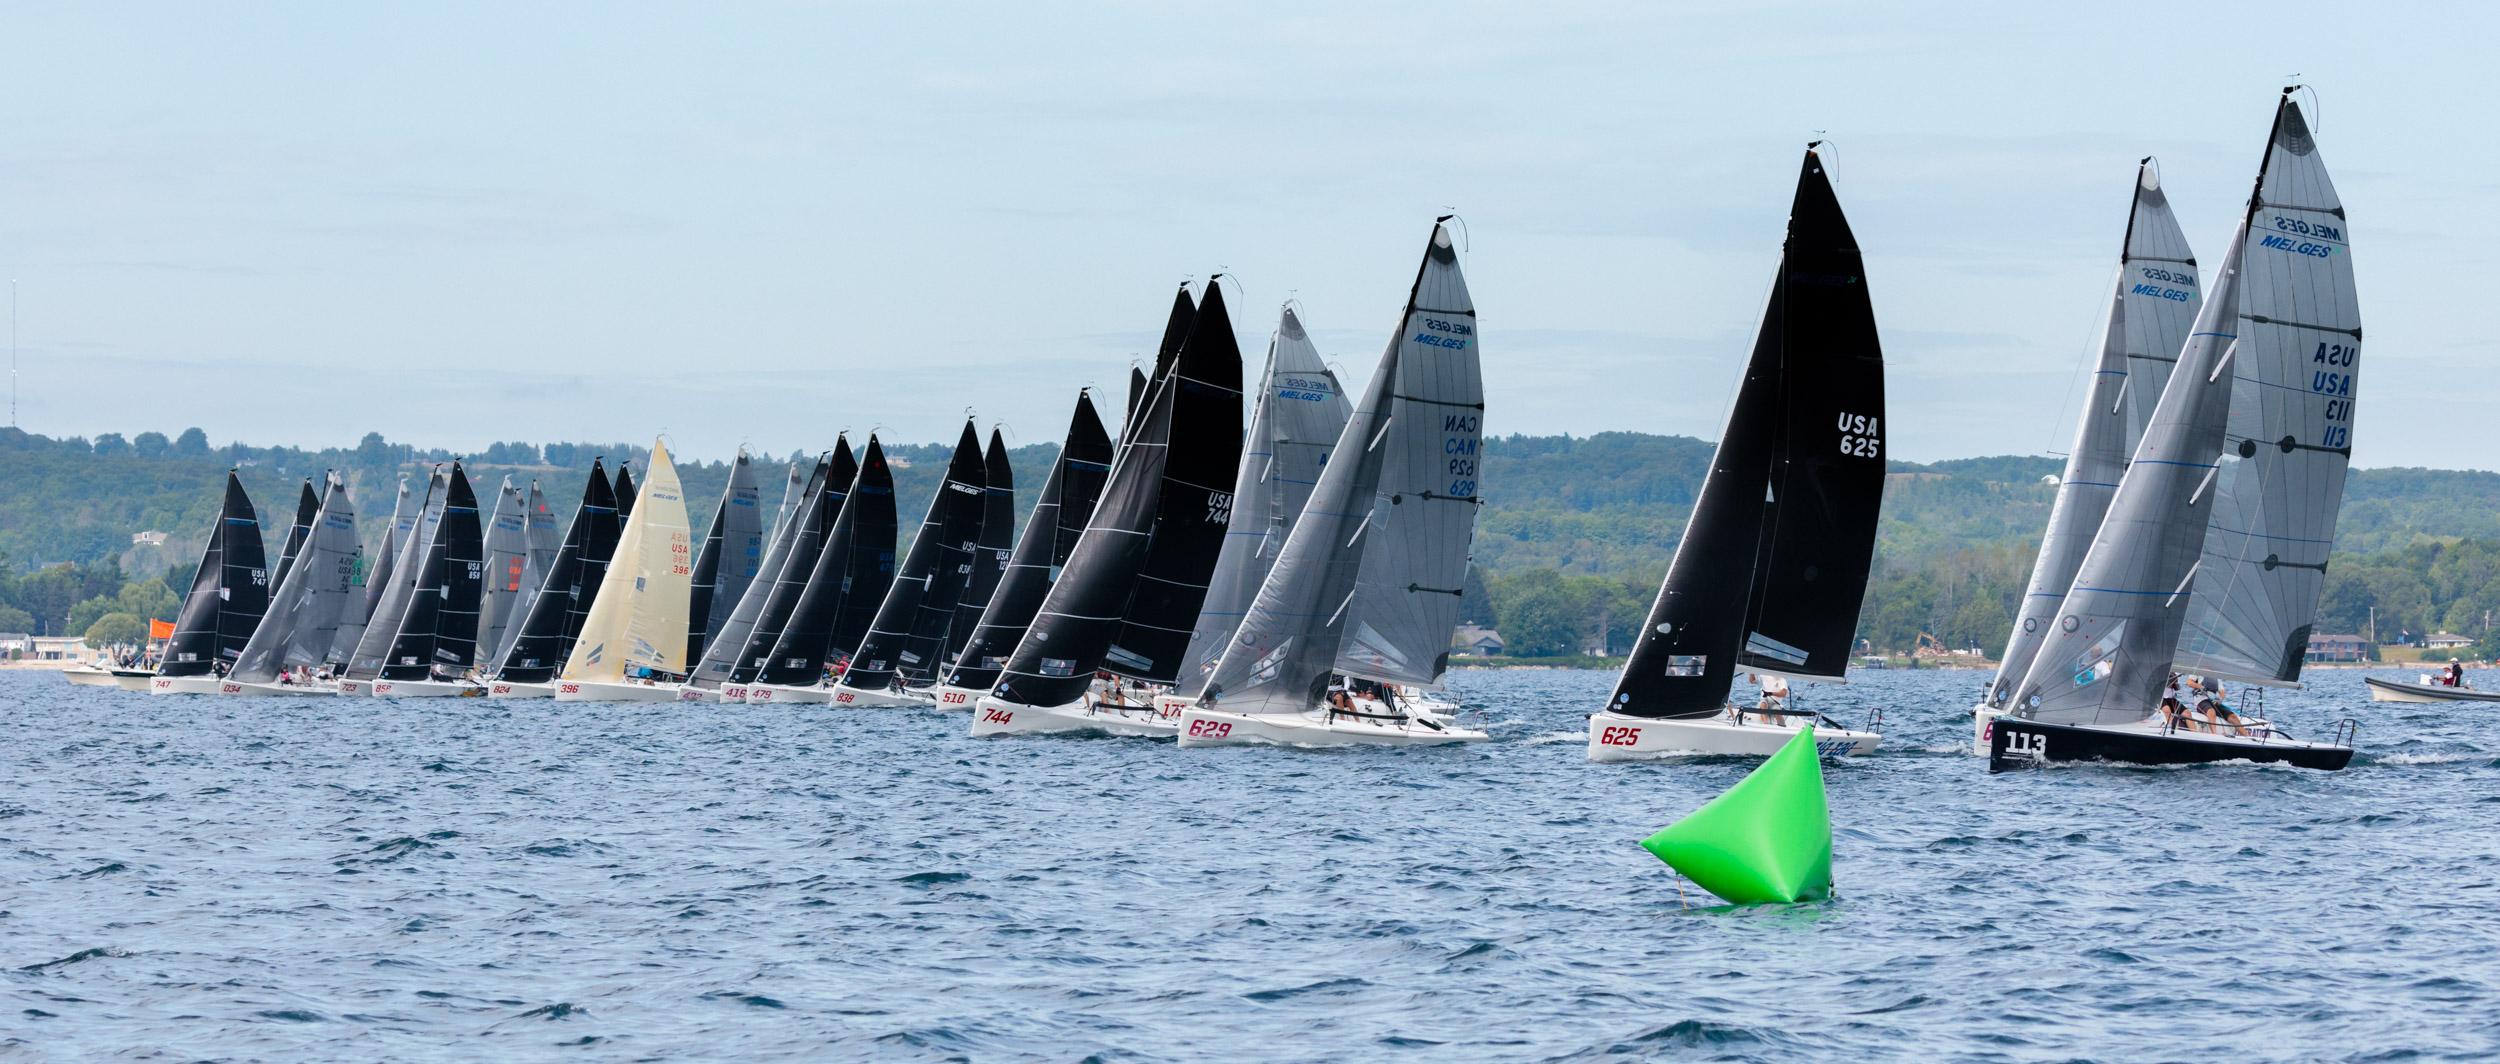 2019 Melges 24 North American Championship fleet racing. © Bill Crawford - Harbor Pictures Company